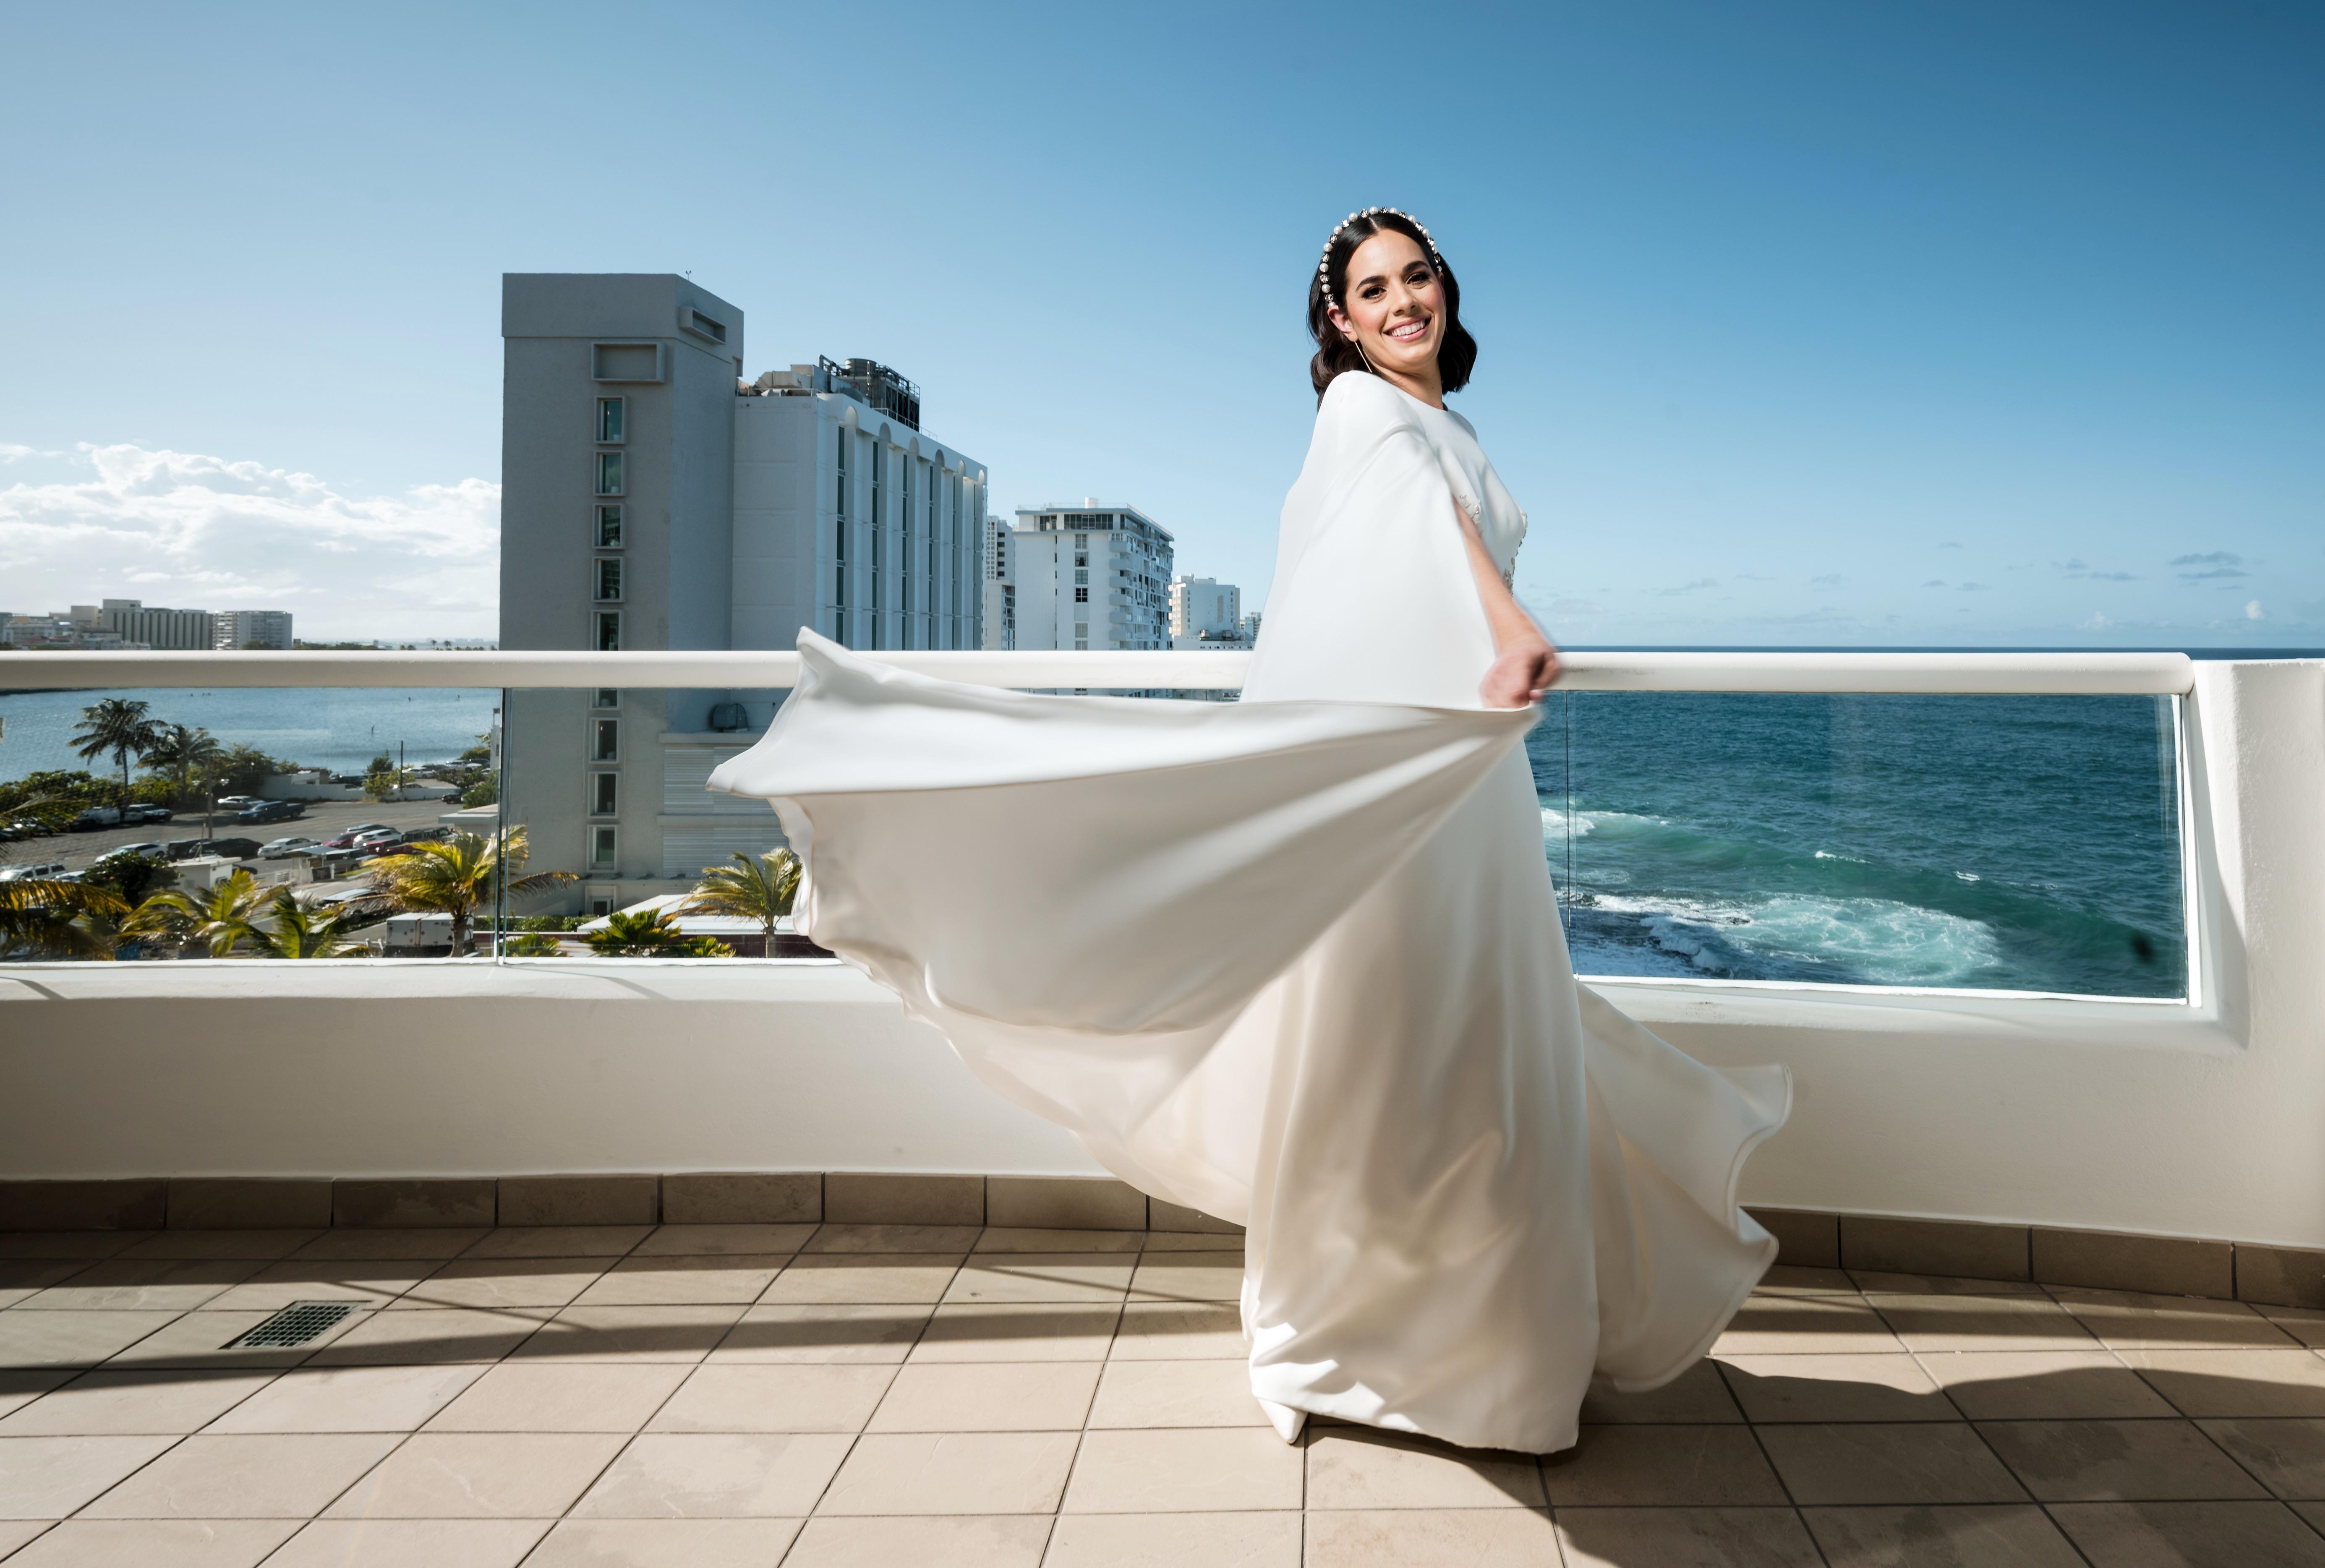 Vestido de la novia: Harry Robles. (Foto: William De La Cruz)